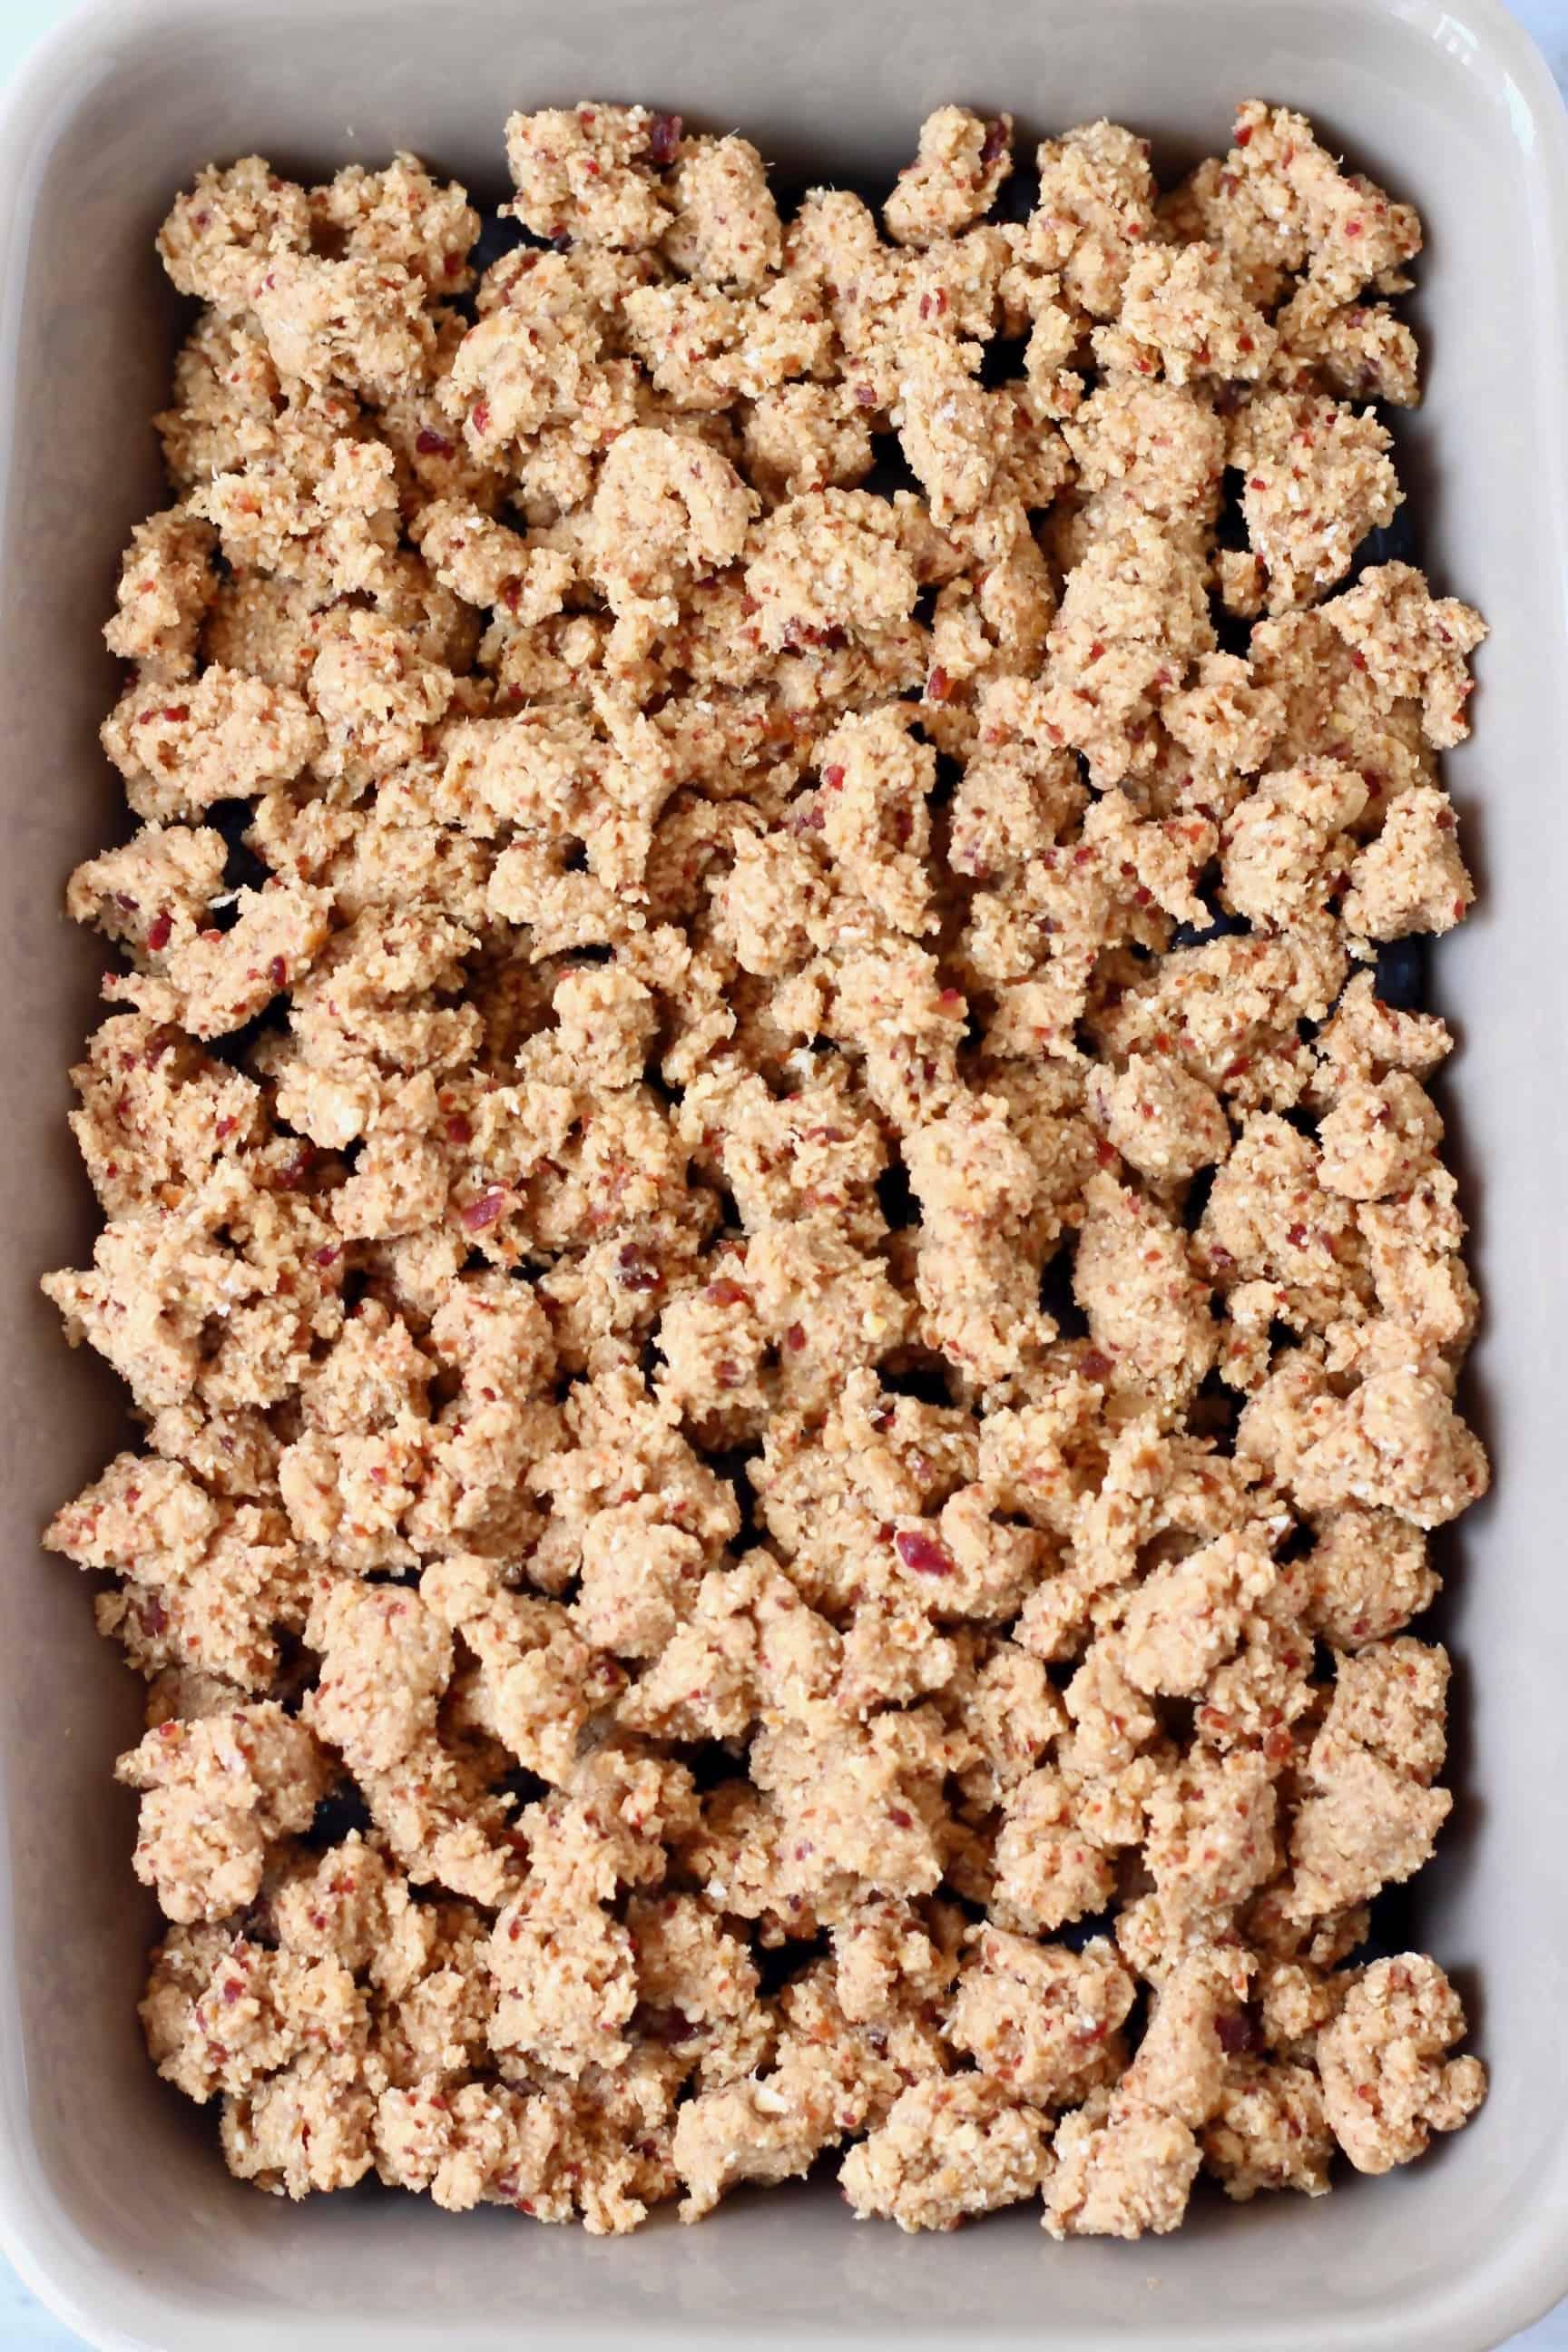 Raw blueberry crisp in a grey rectangular baking